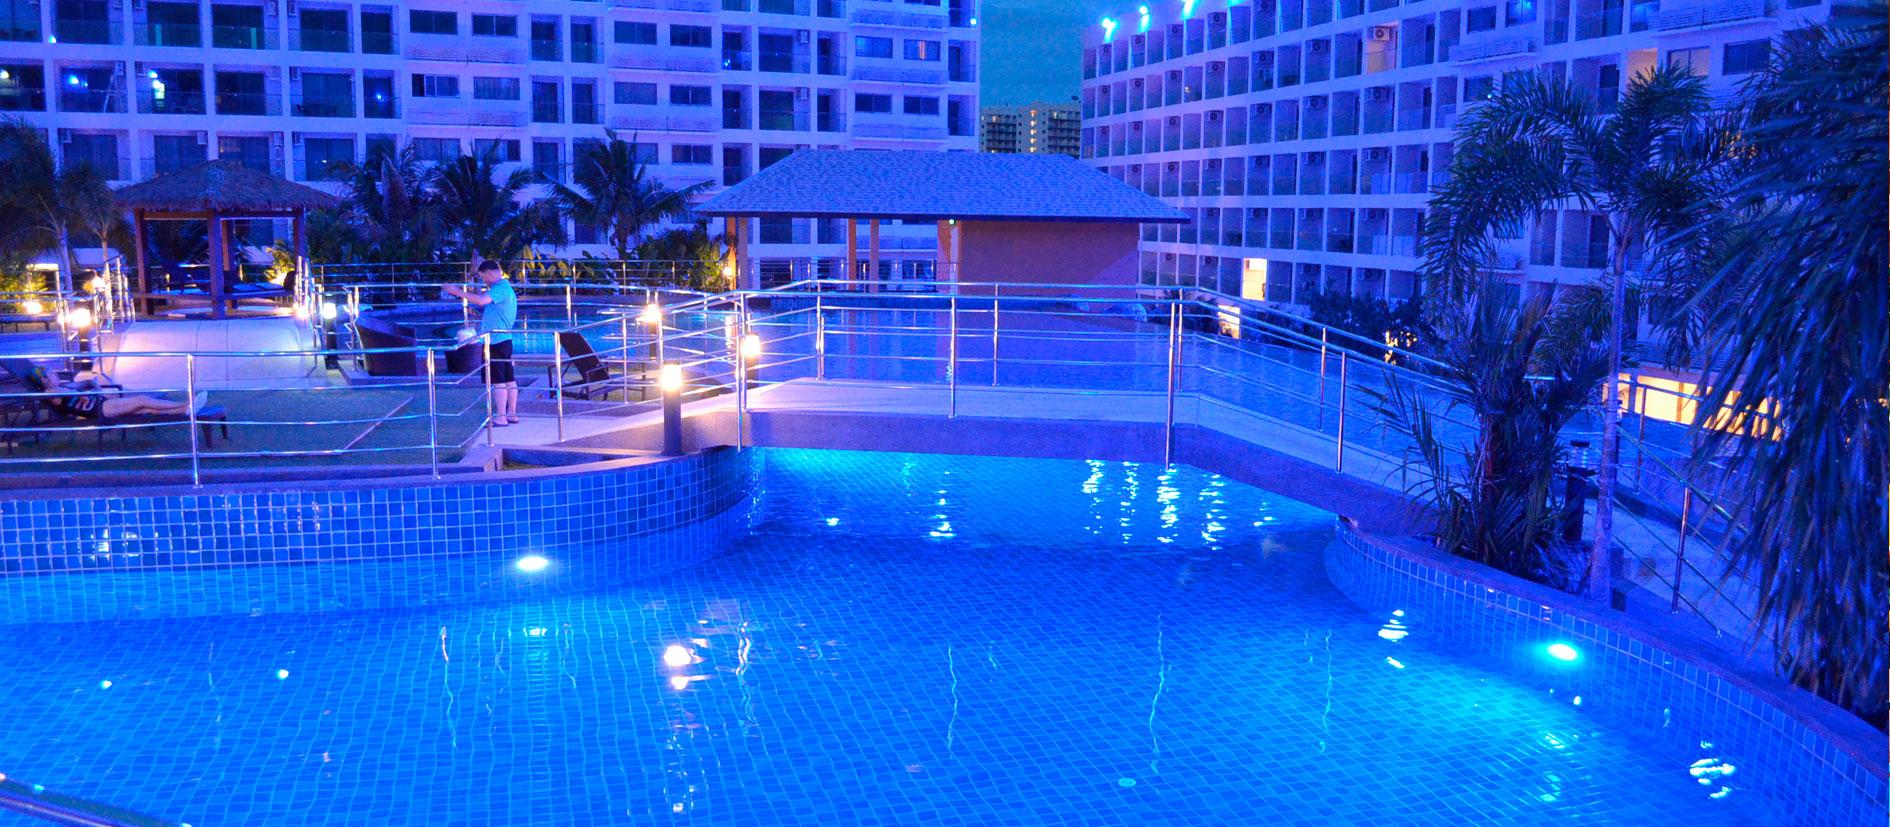 Laguna Beach Resort 3 — The Maldives